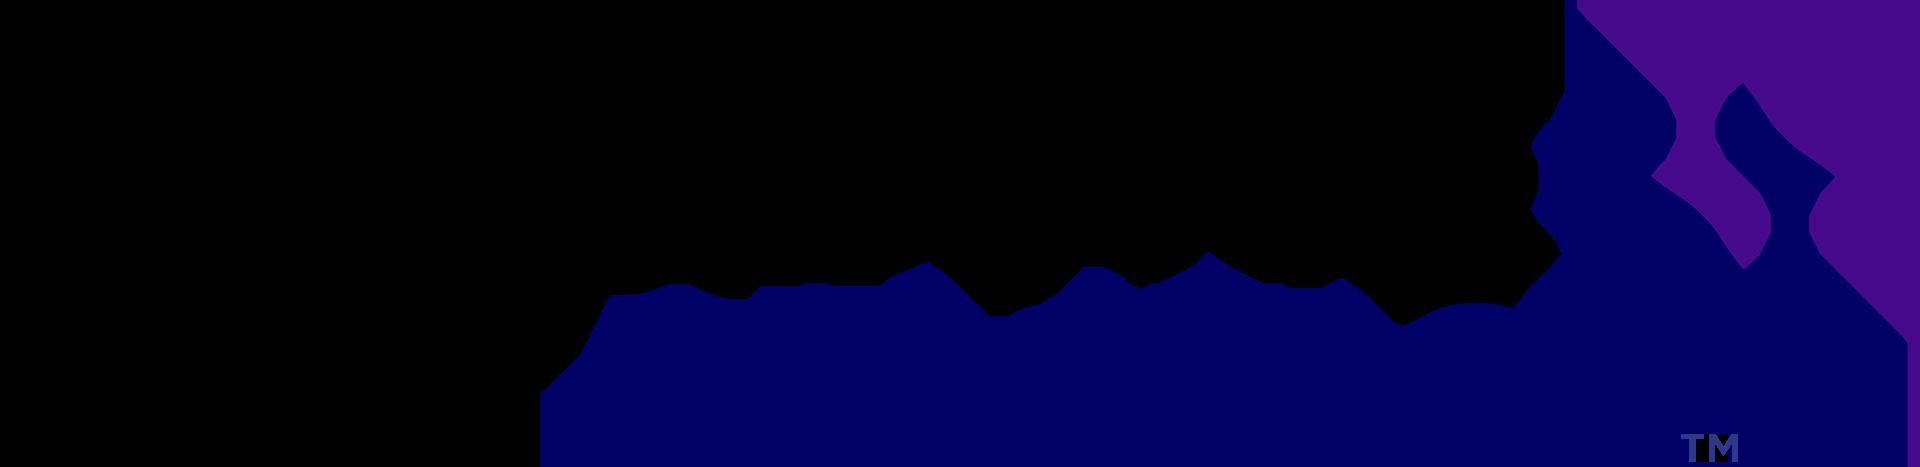 Distruptive MedTech TM logo